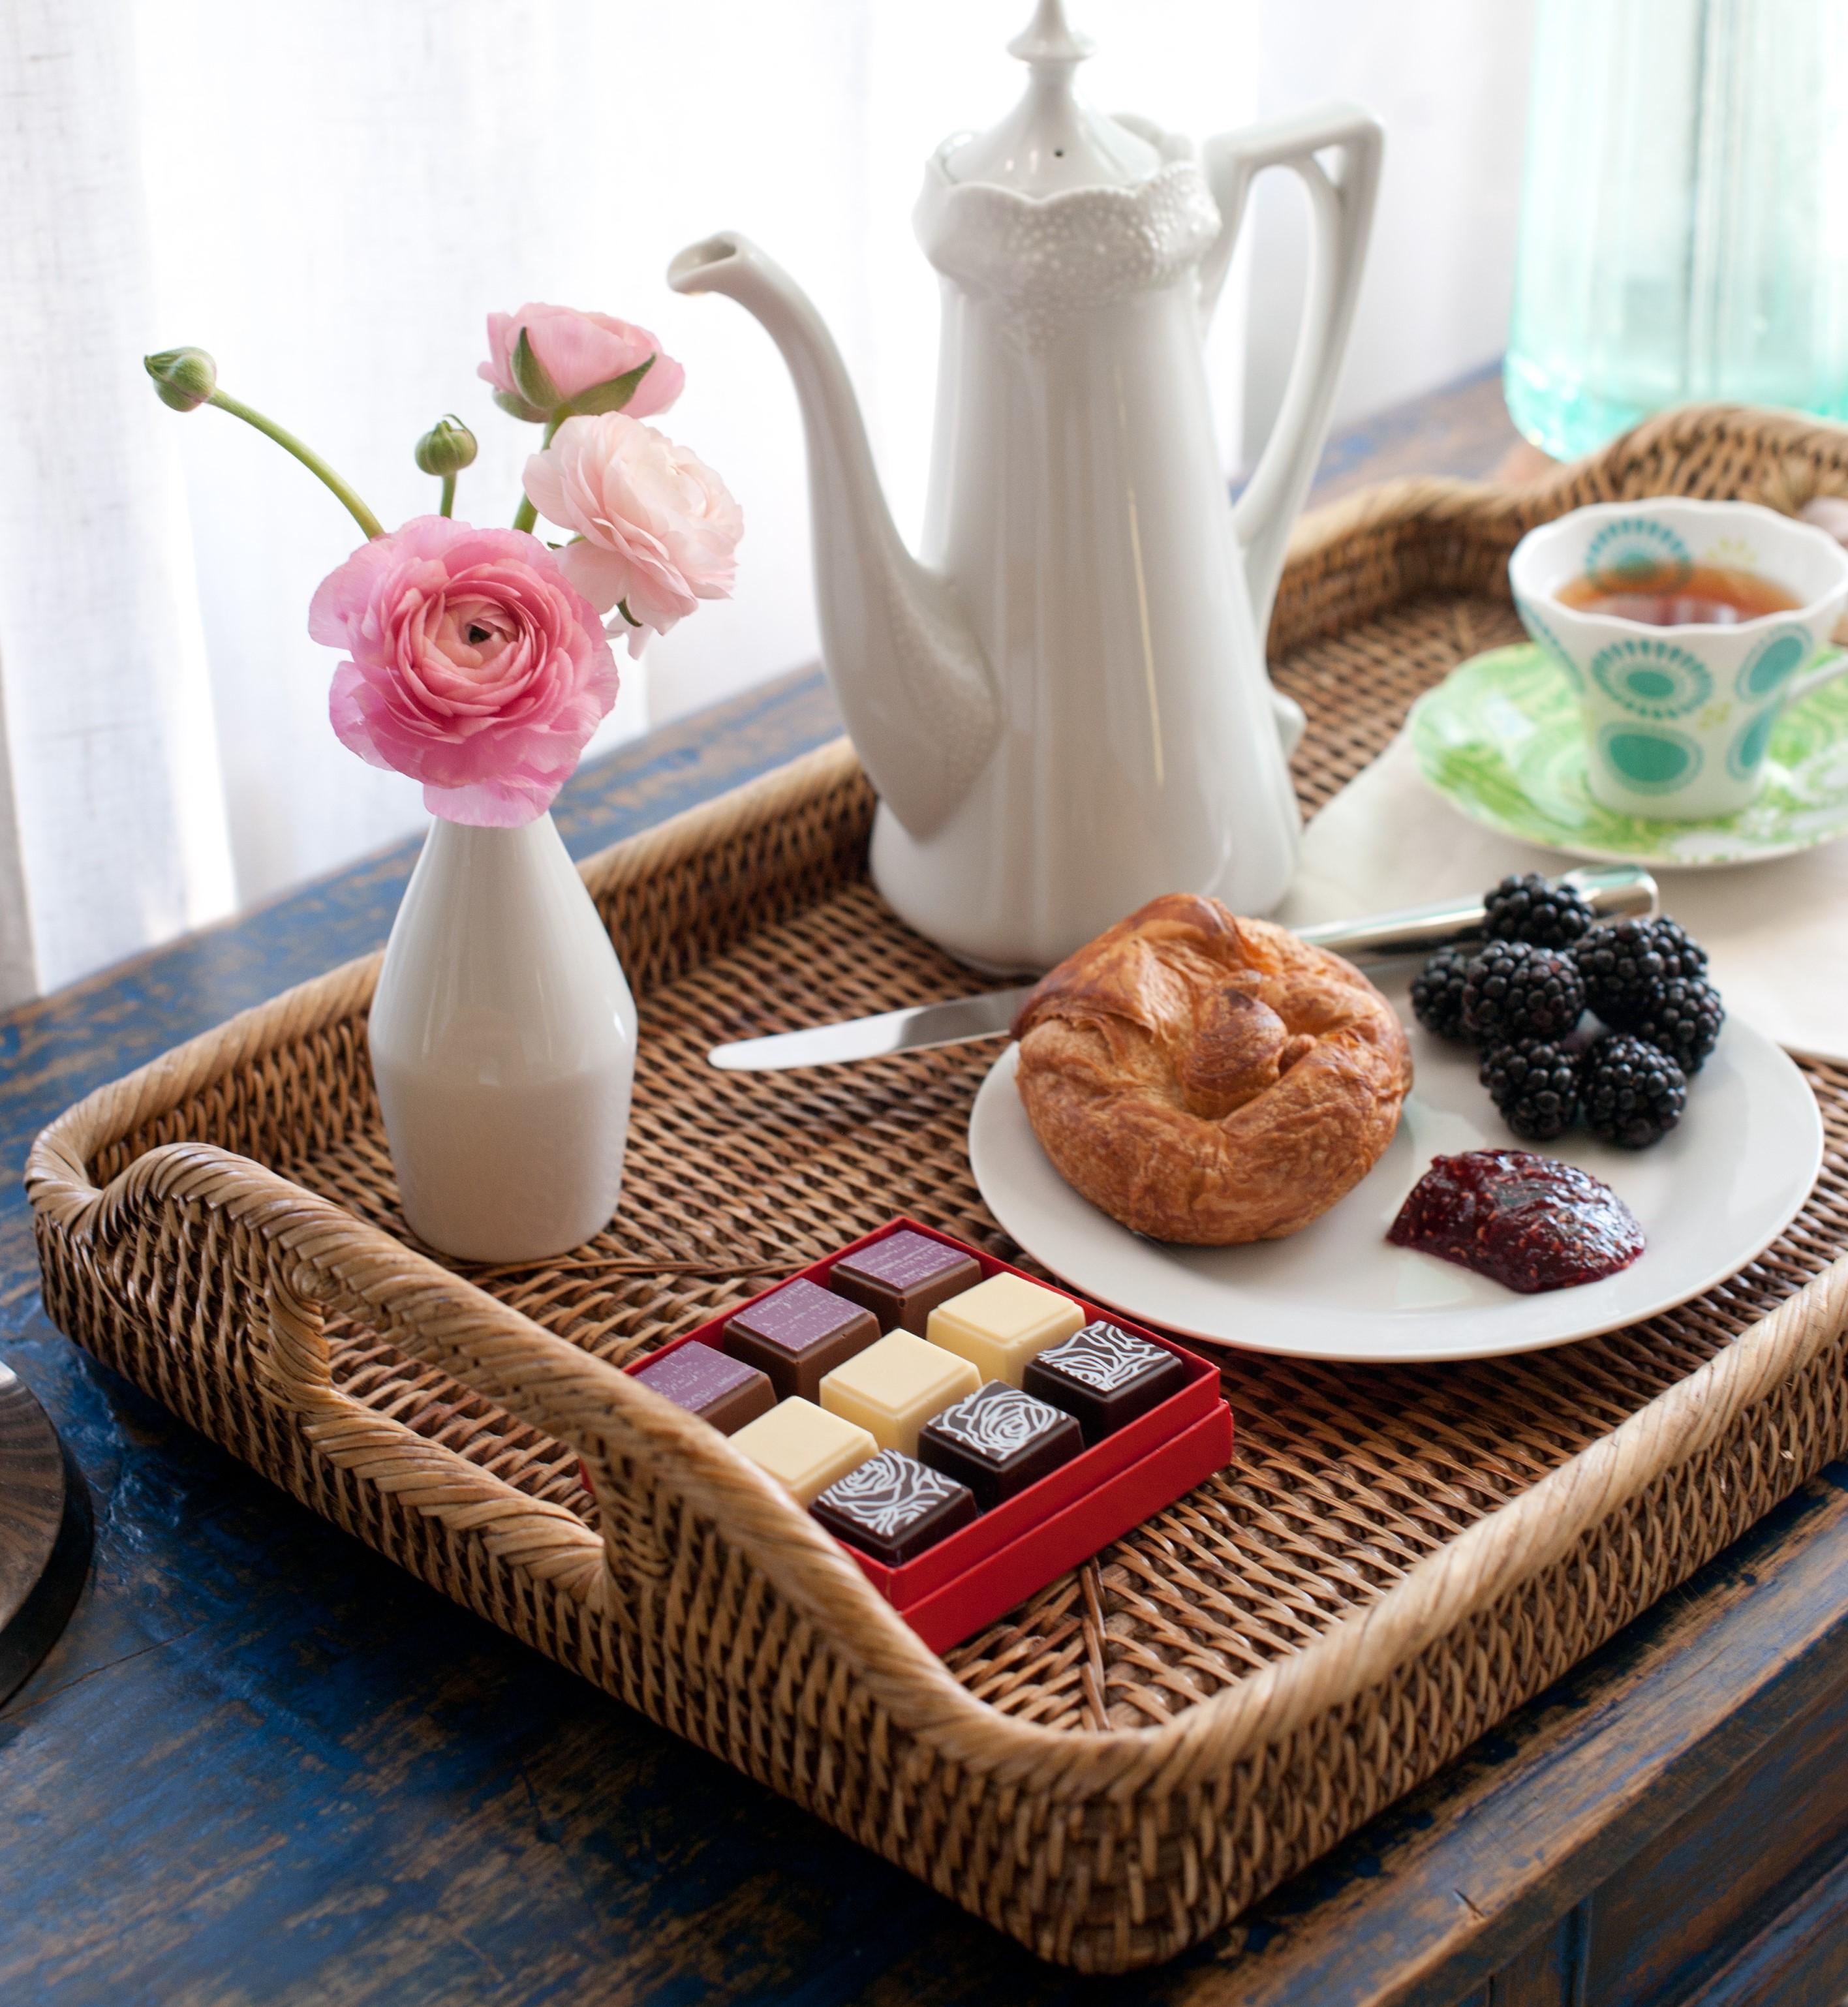 Delysia-Chocolatier-Spring-Mothers-Day-chocolate-Austin-Texas-shop-45